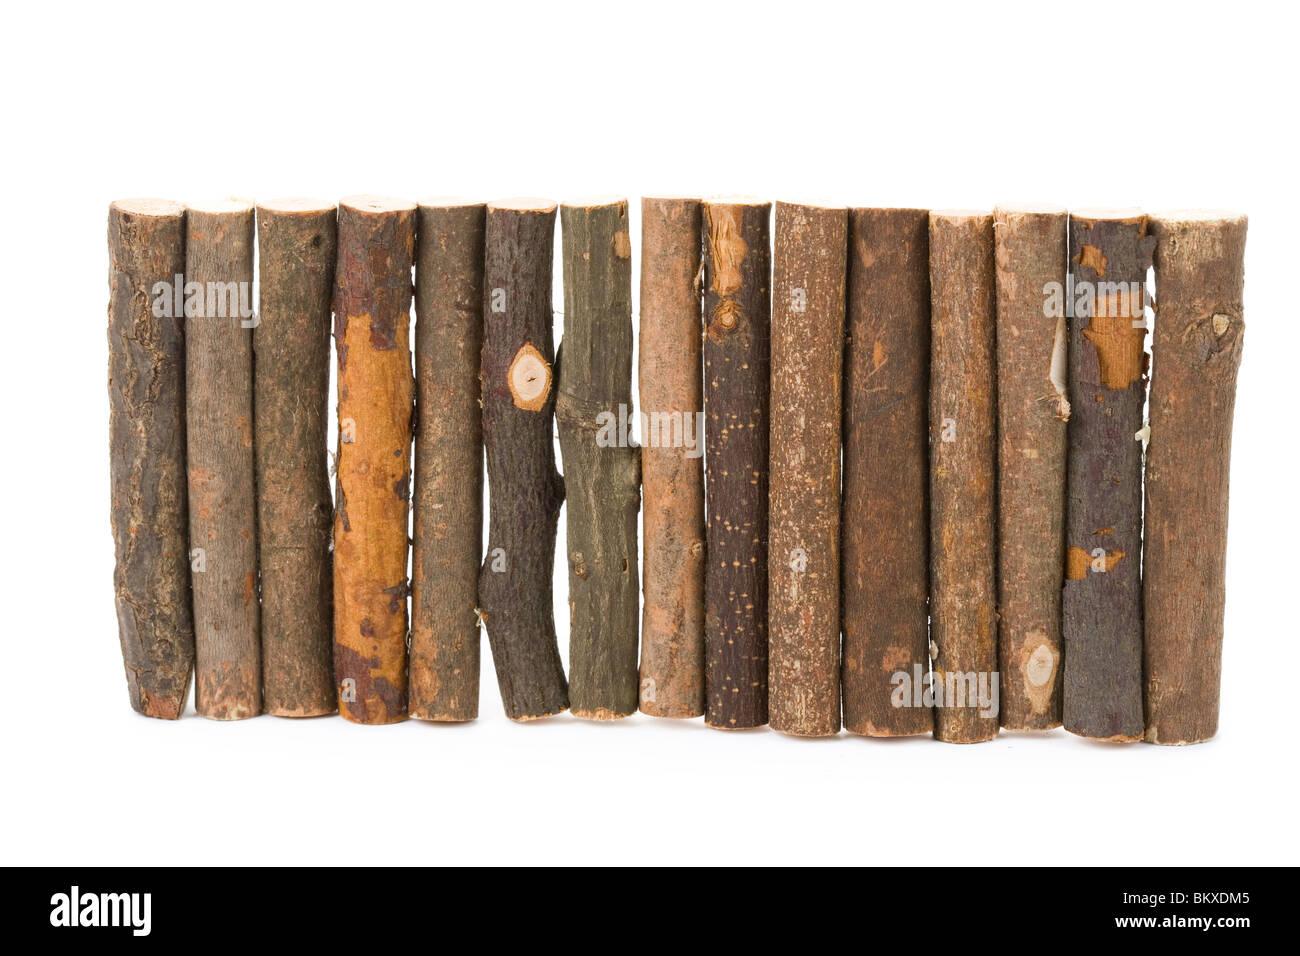 log close up shot for background - Stock Image